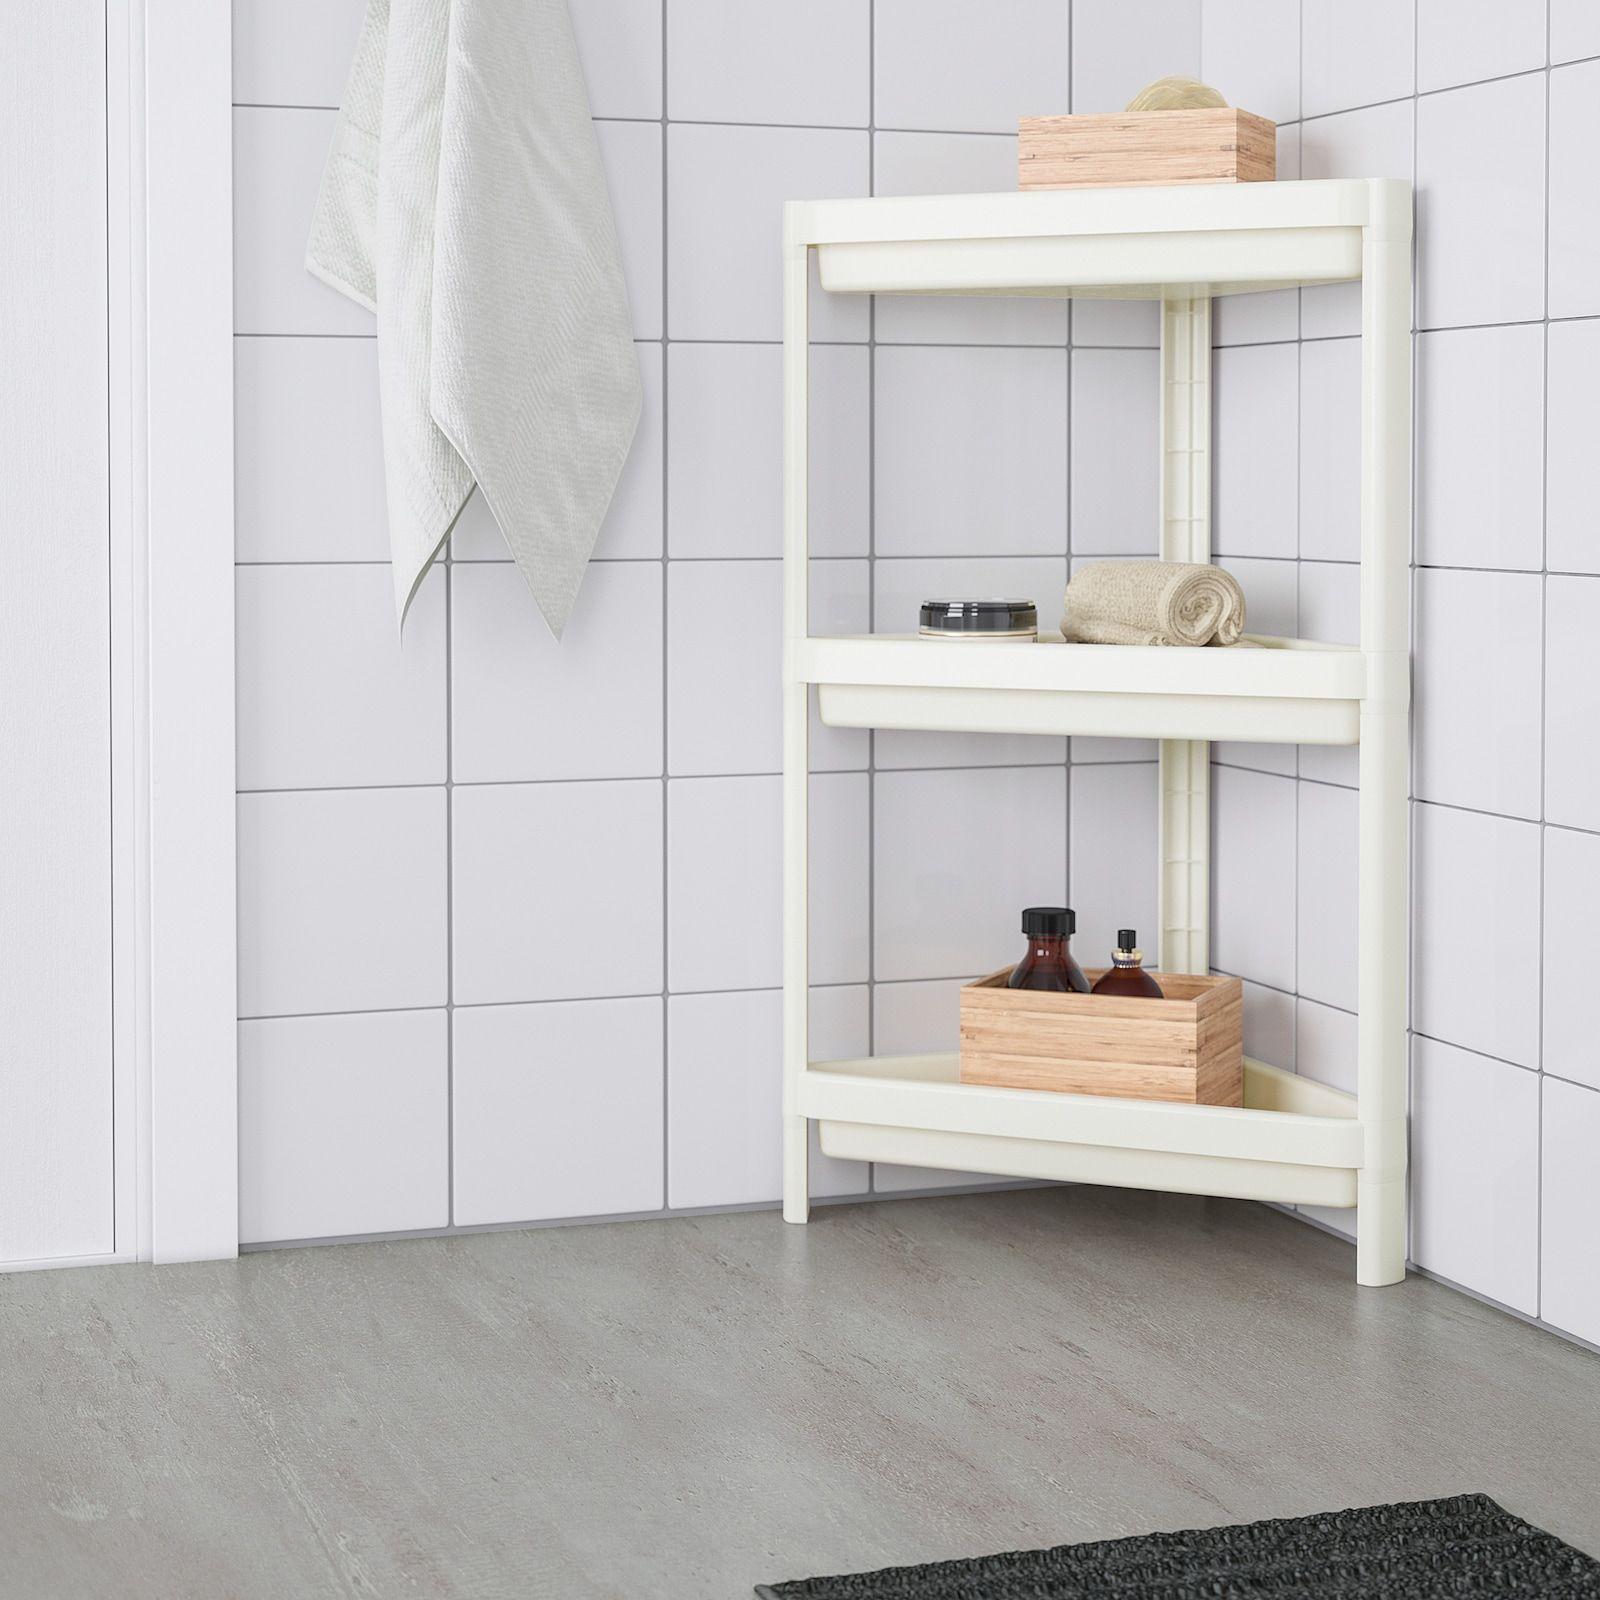 Bathroom Storage Furniture Ikea Bathroom Furniture Storage Bathroom Cabinets Ikea White Corner Cabinet